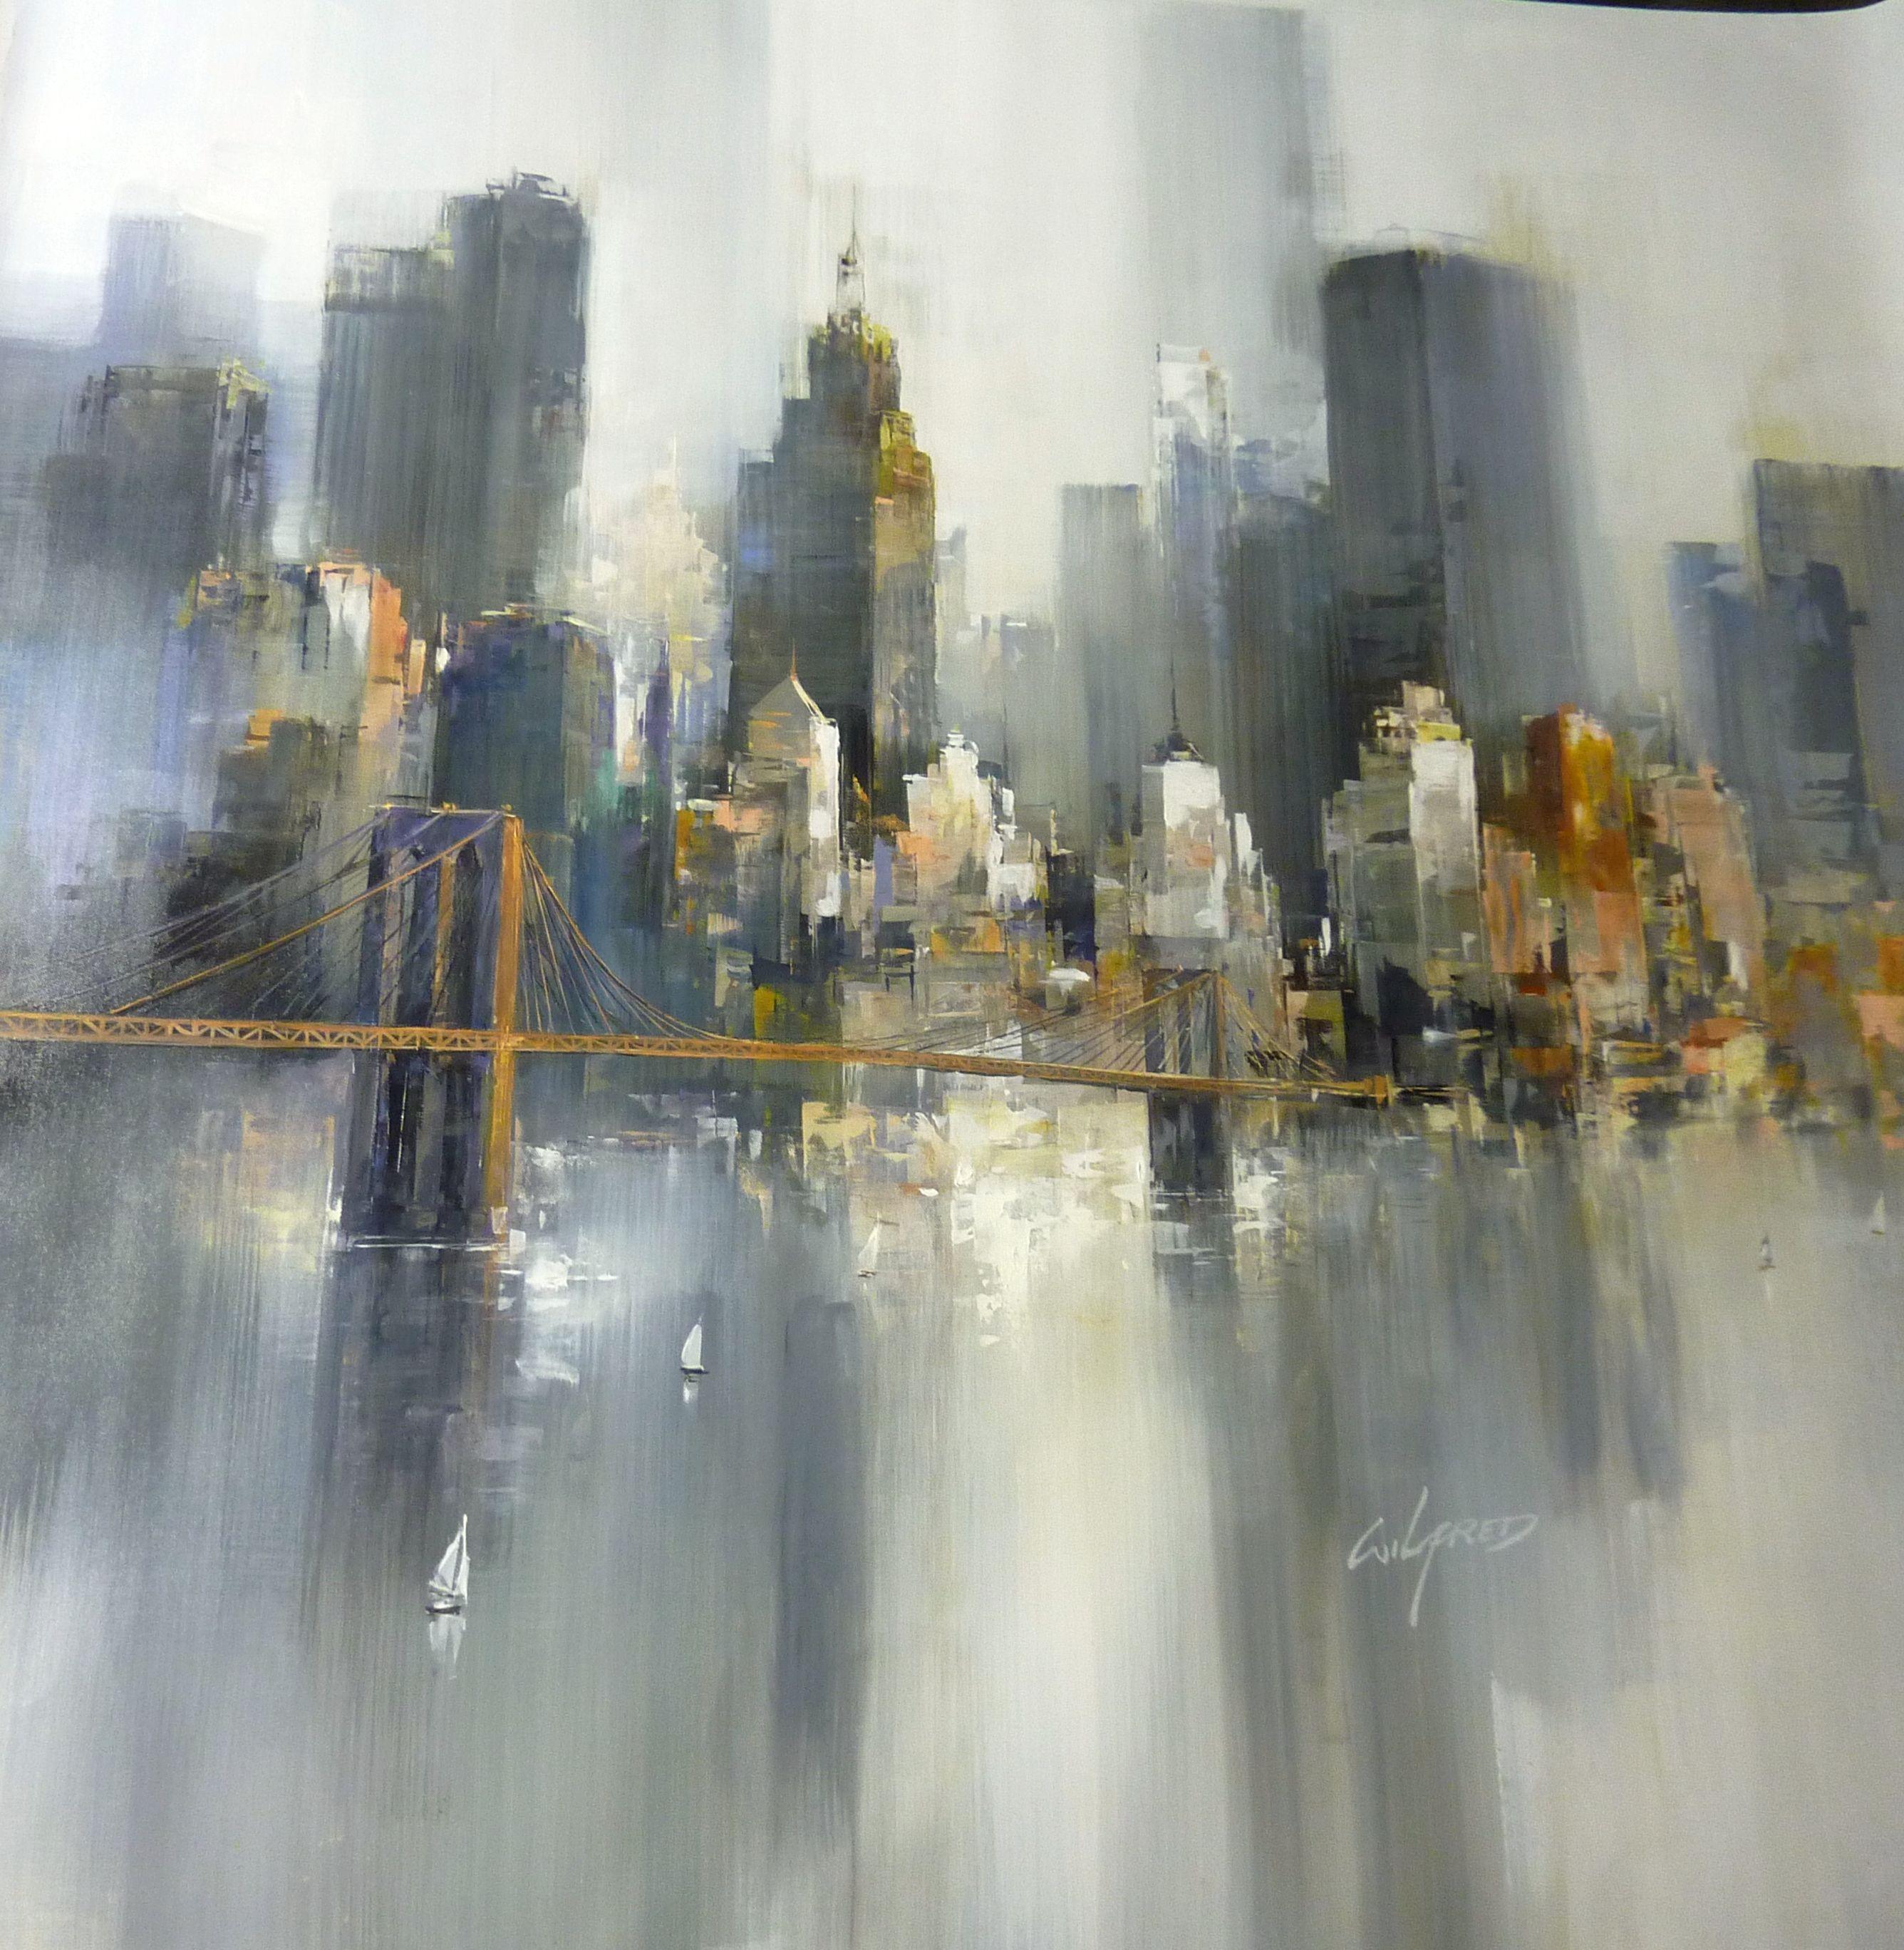 New York, artist WILFRED , | My art | Pinterest | Paintings ...